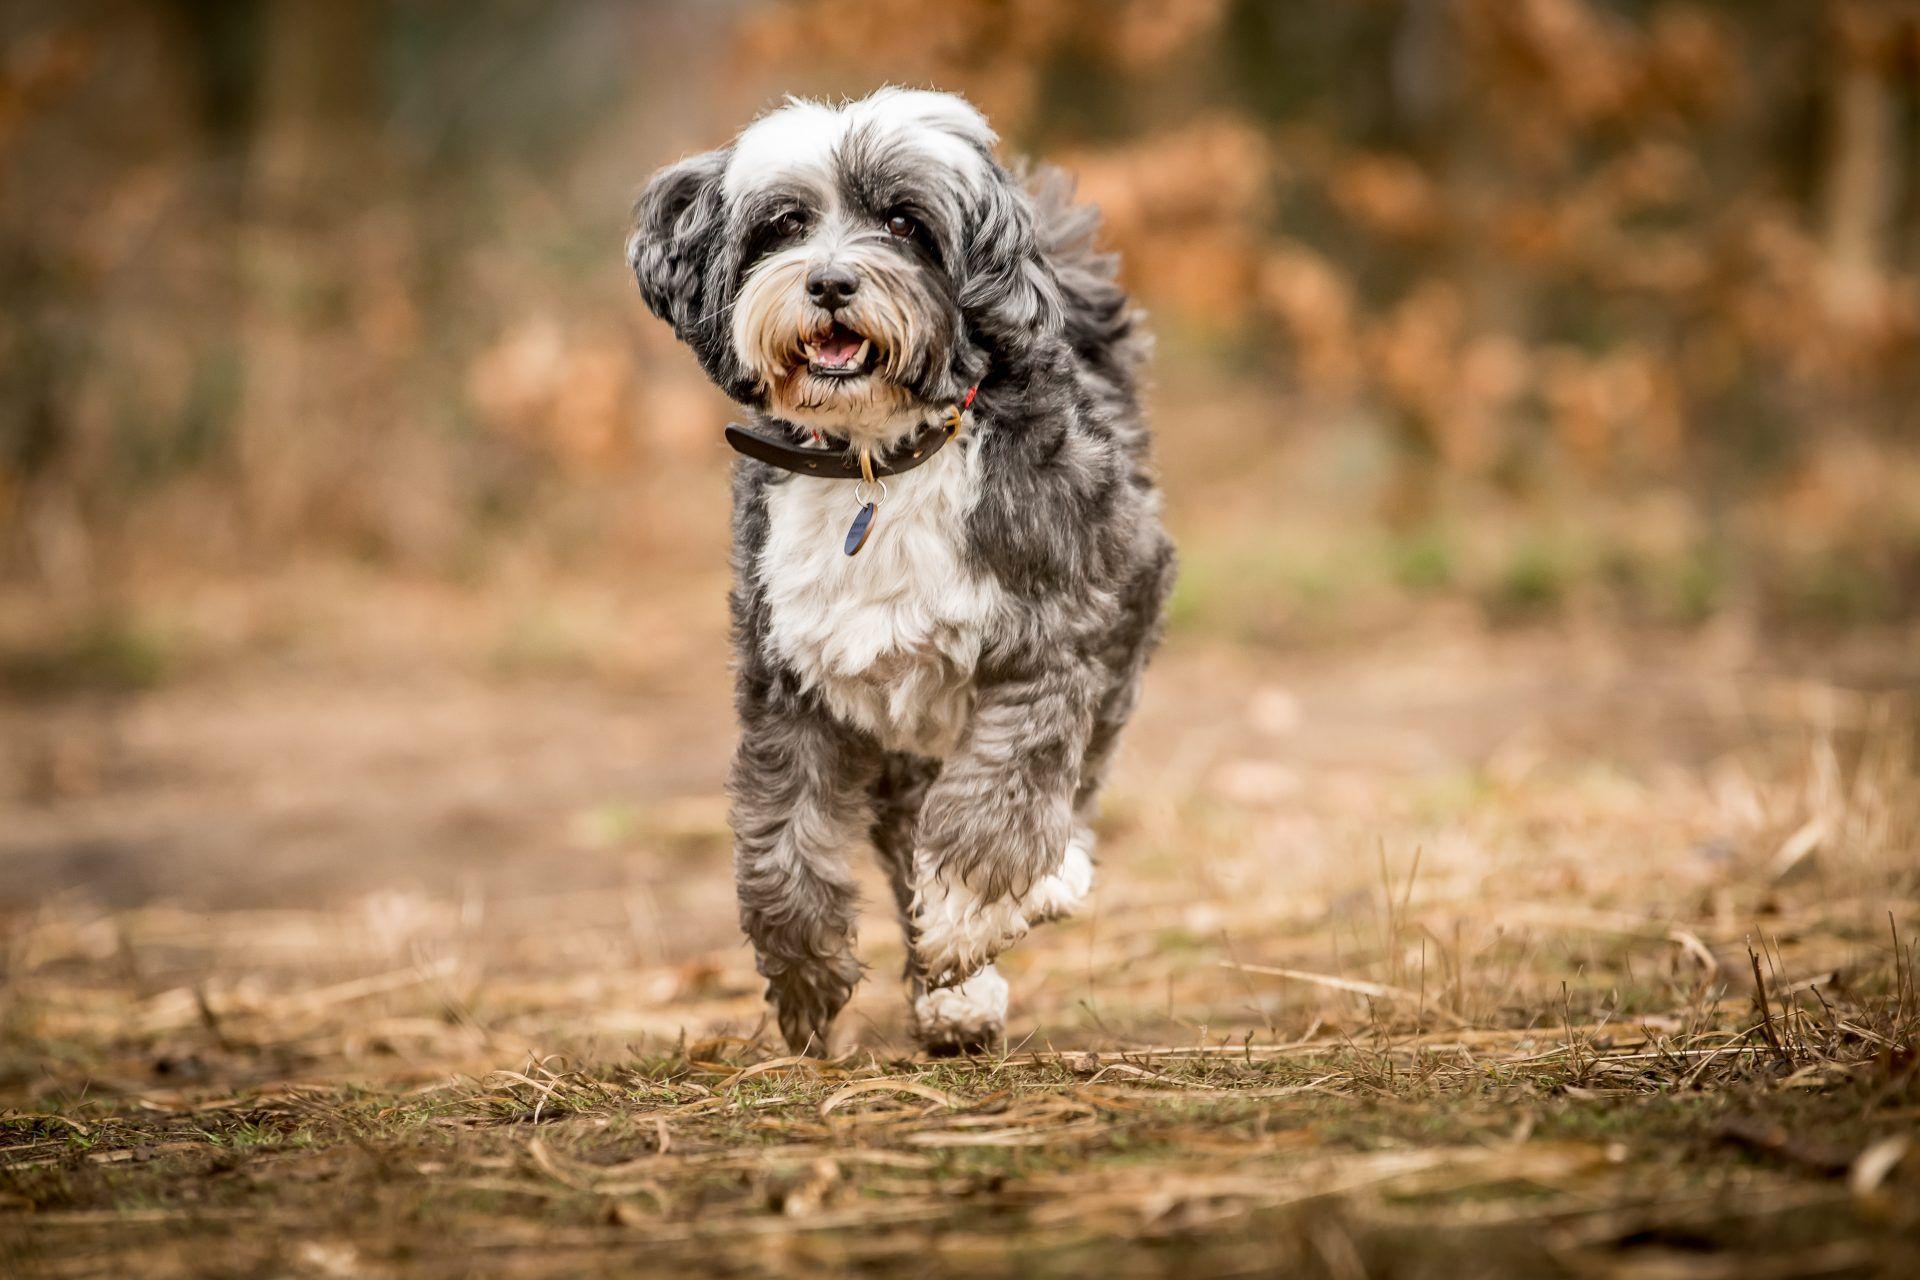 Jonnie Hearn And His Tibetan Terrier Skye Tibetan Terrier The Kennel Club British Dog